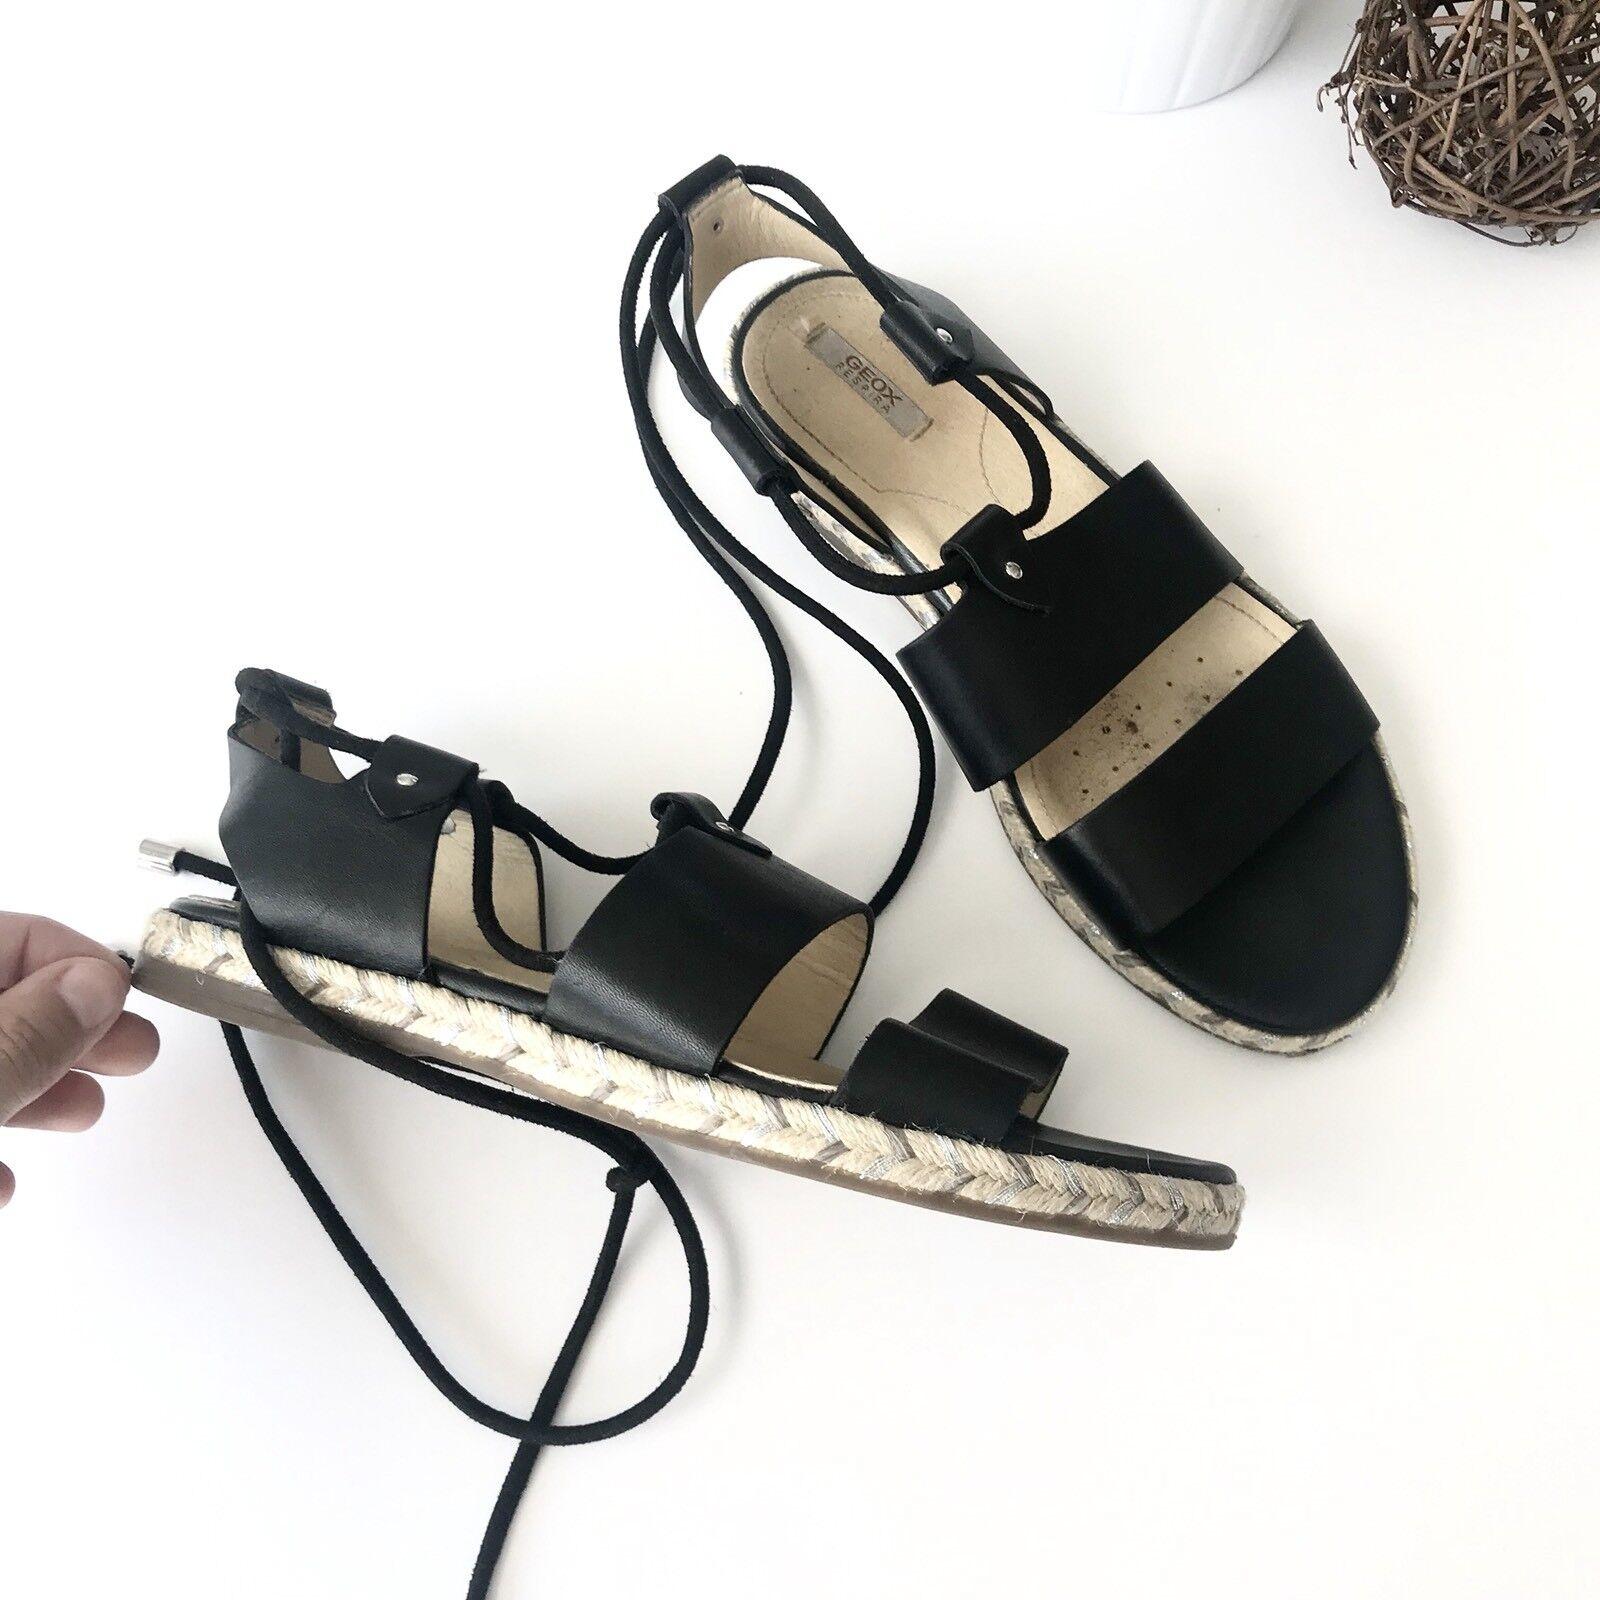 GEOX RESPIRA Women's 36 Black Leather Open Toe Ankle Wrap Flat Sandals